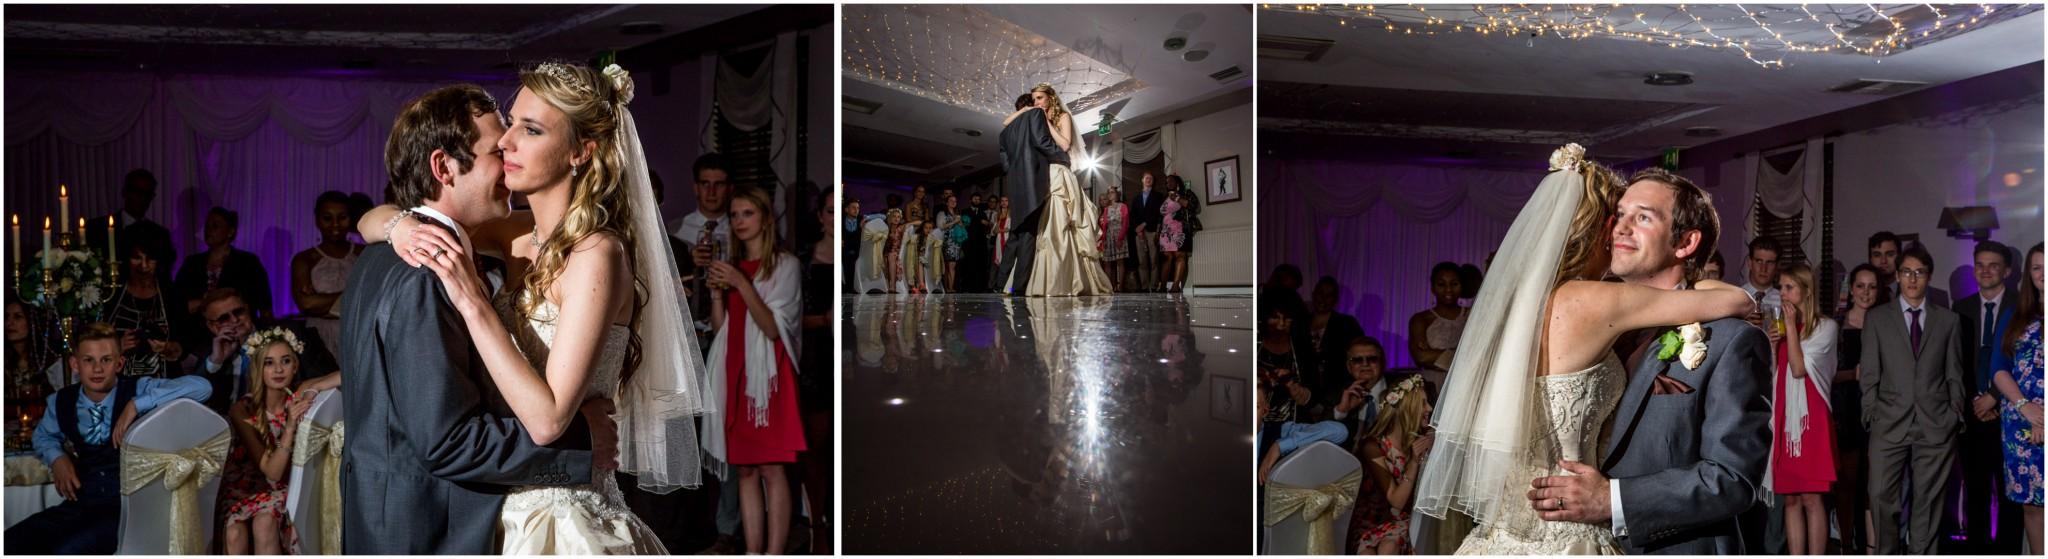 Highfield Park Wedding Photography Photos of first dance